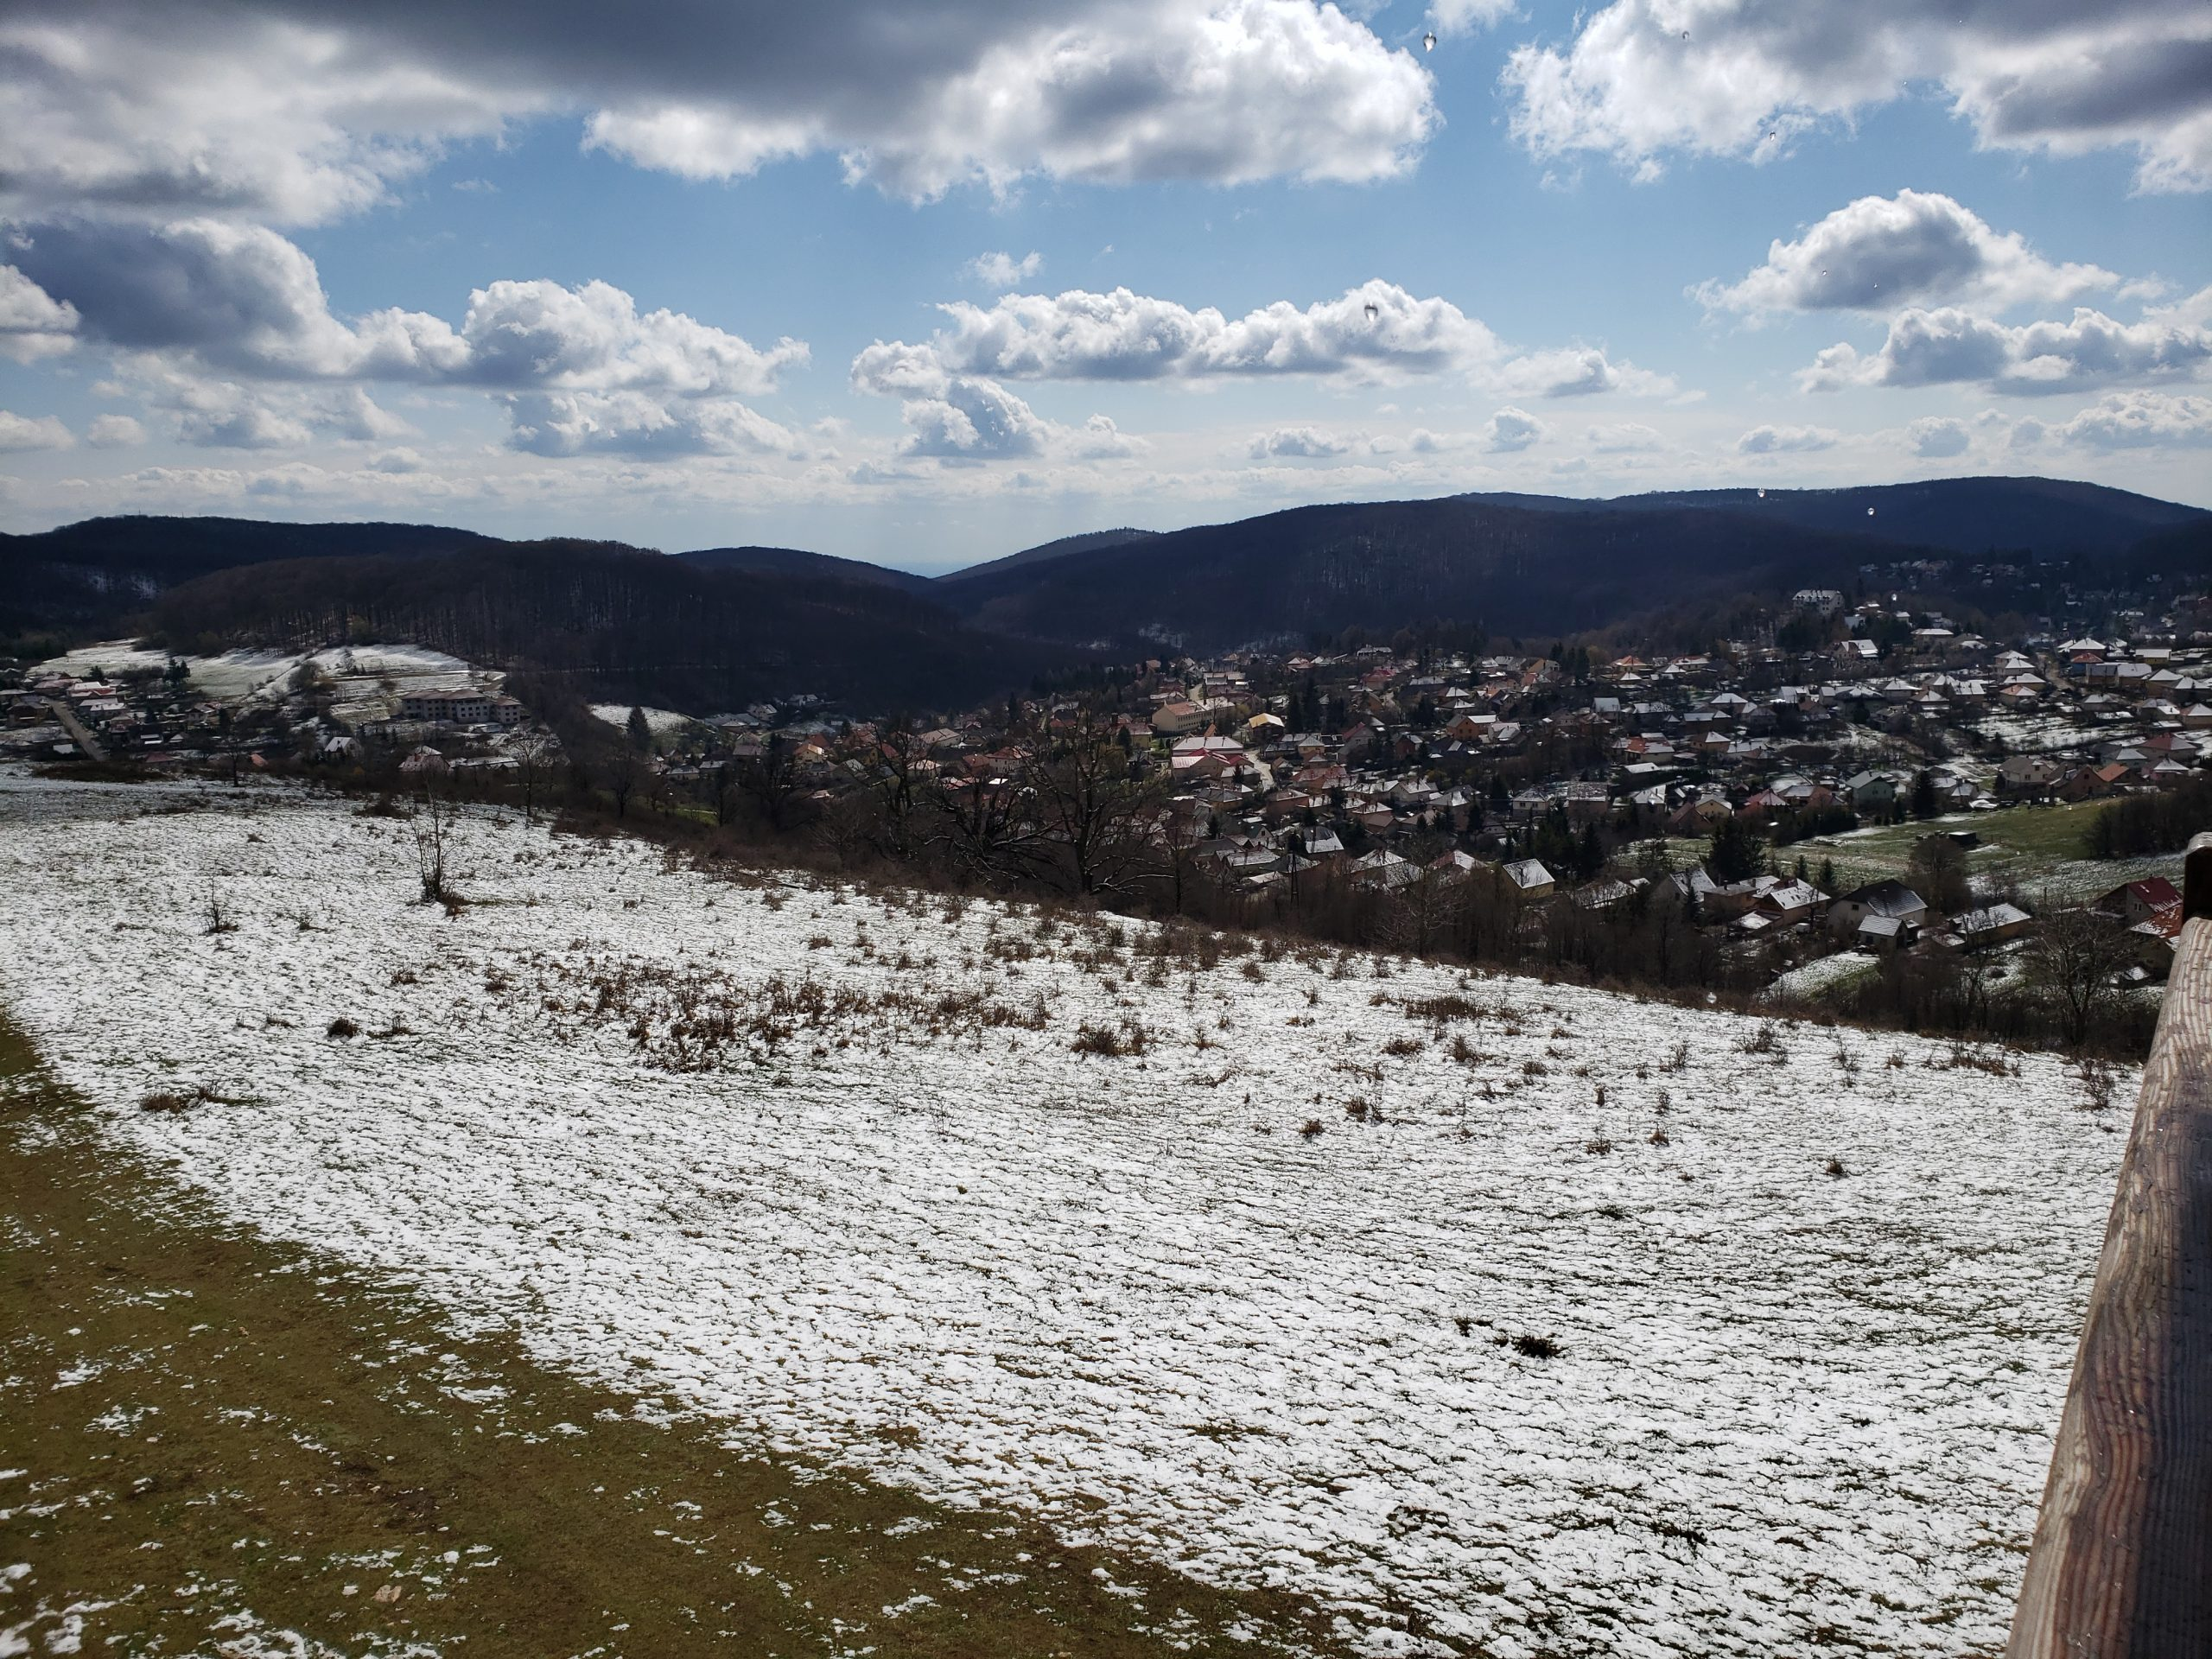 snowy field near hills during daytime